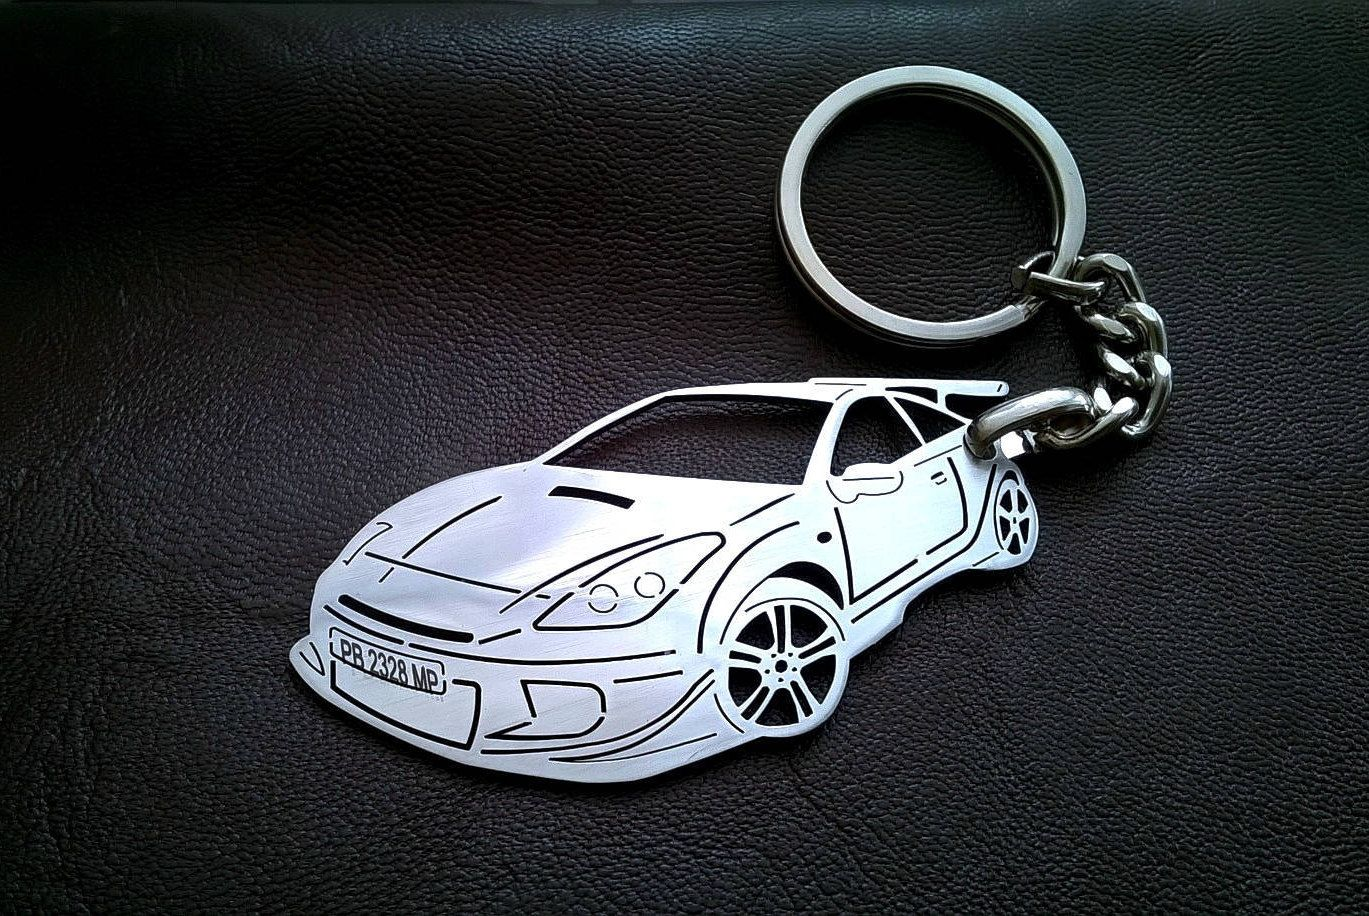 Toyota celica toyota personalized key chain toyota tacoma custom keychain stainless steel